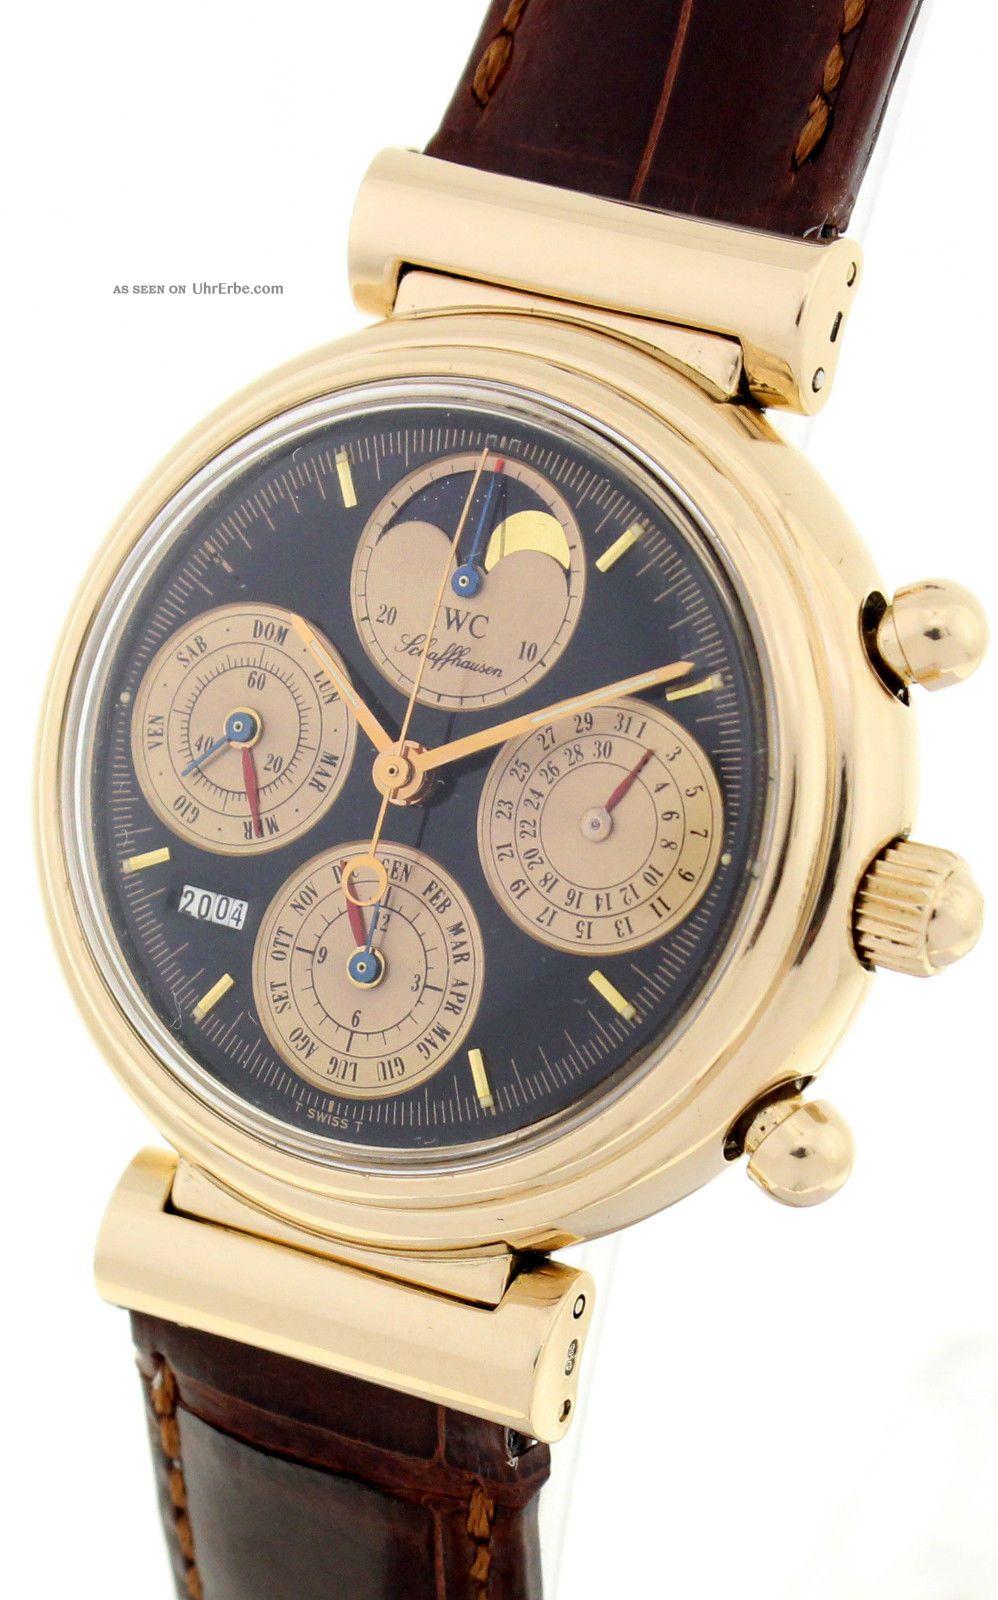 Iwc Da Vinci Limited Edition 120 StÜck Ref 3750 - Rotgold - Ewiger Kalender Armbanduhren Bild